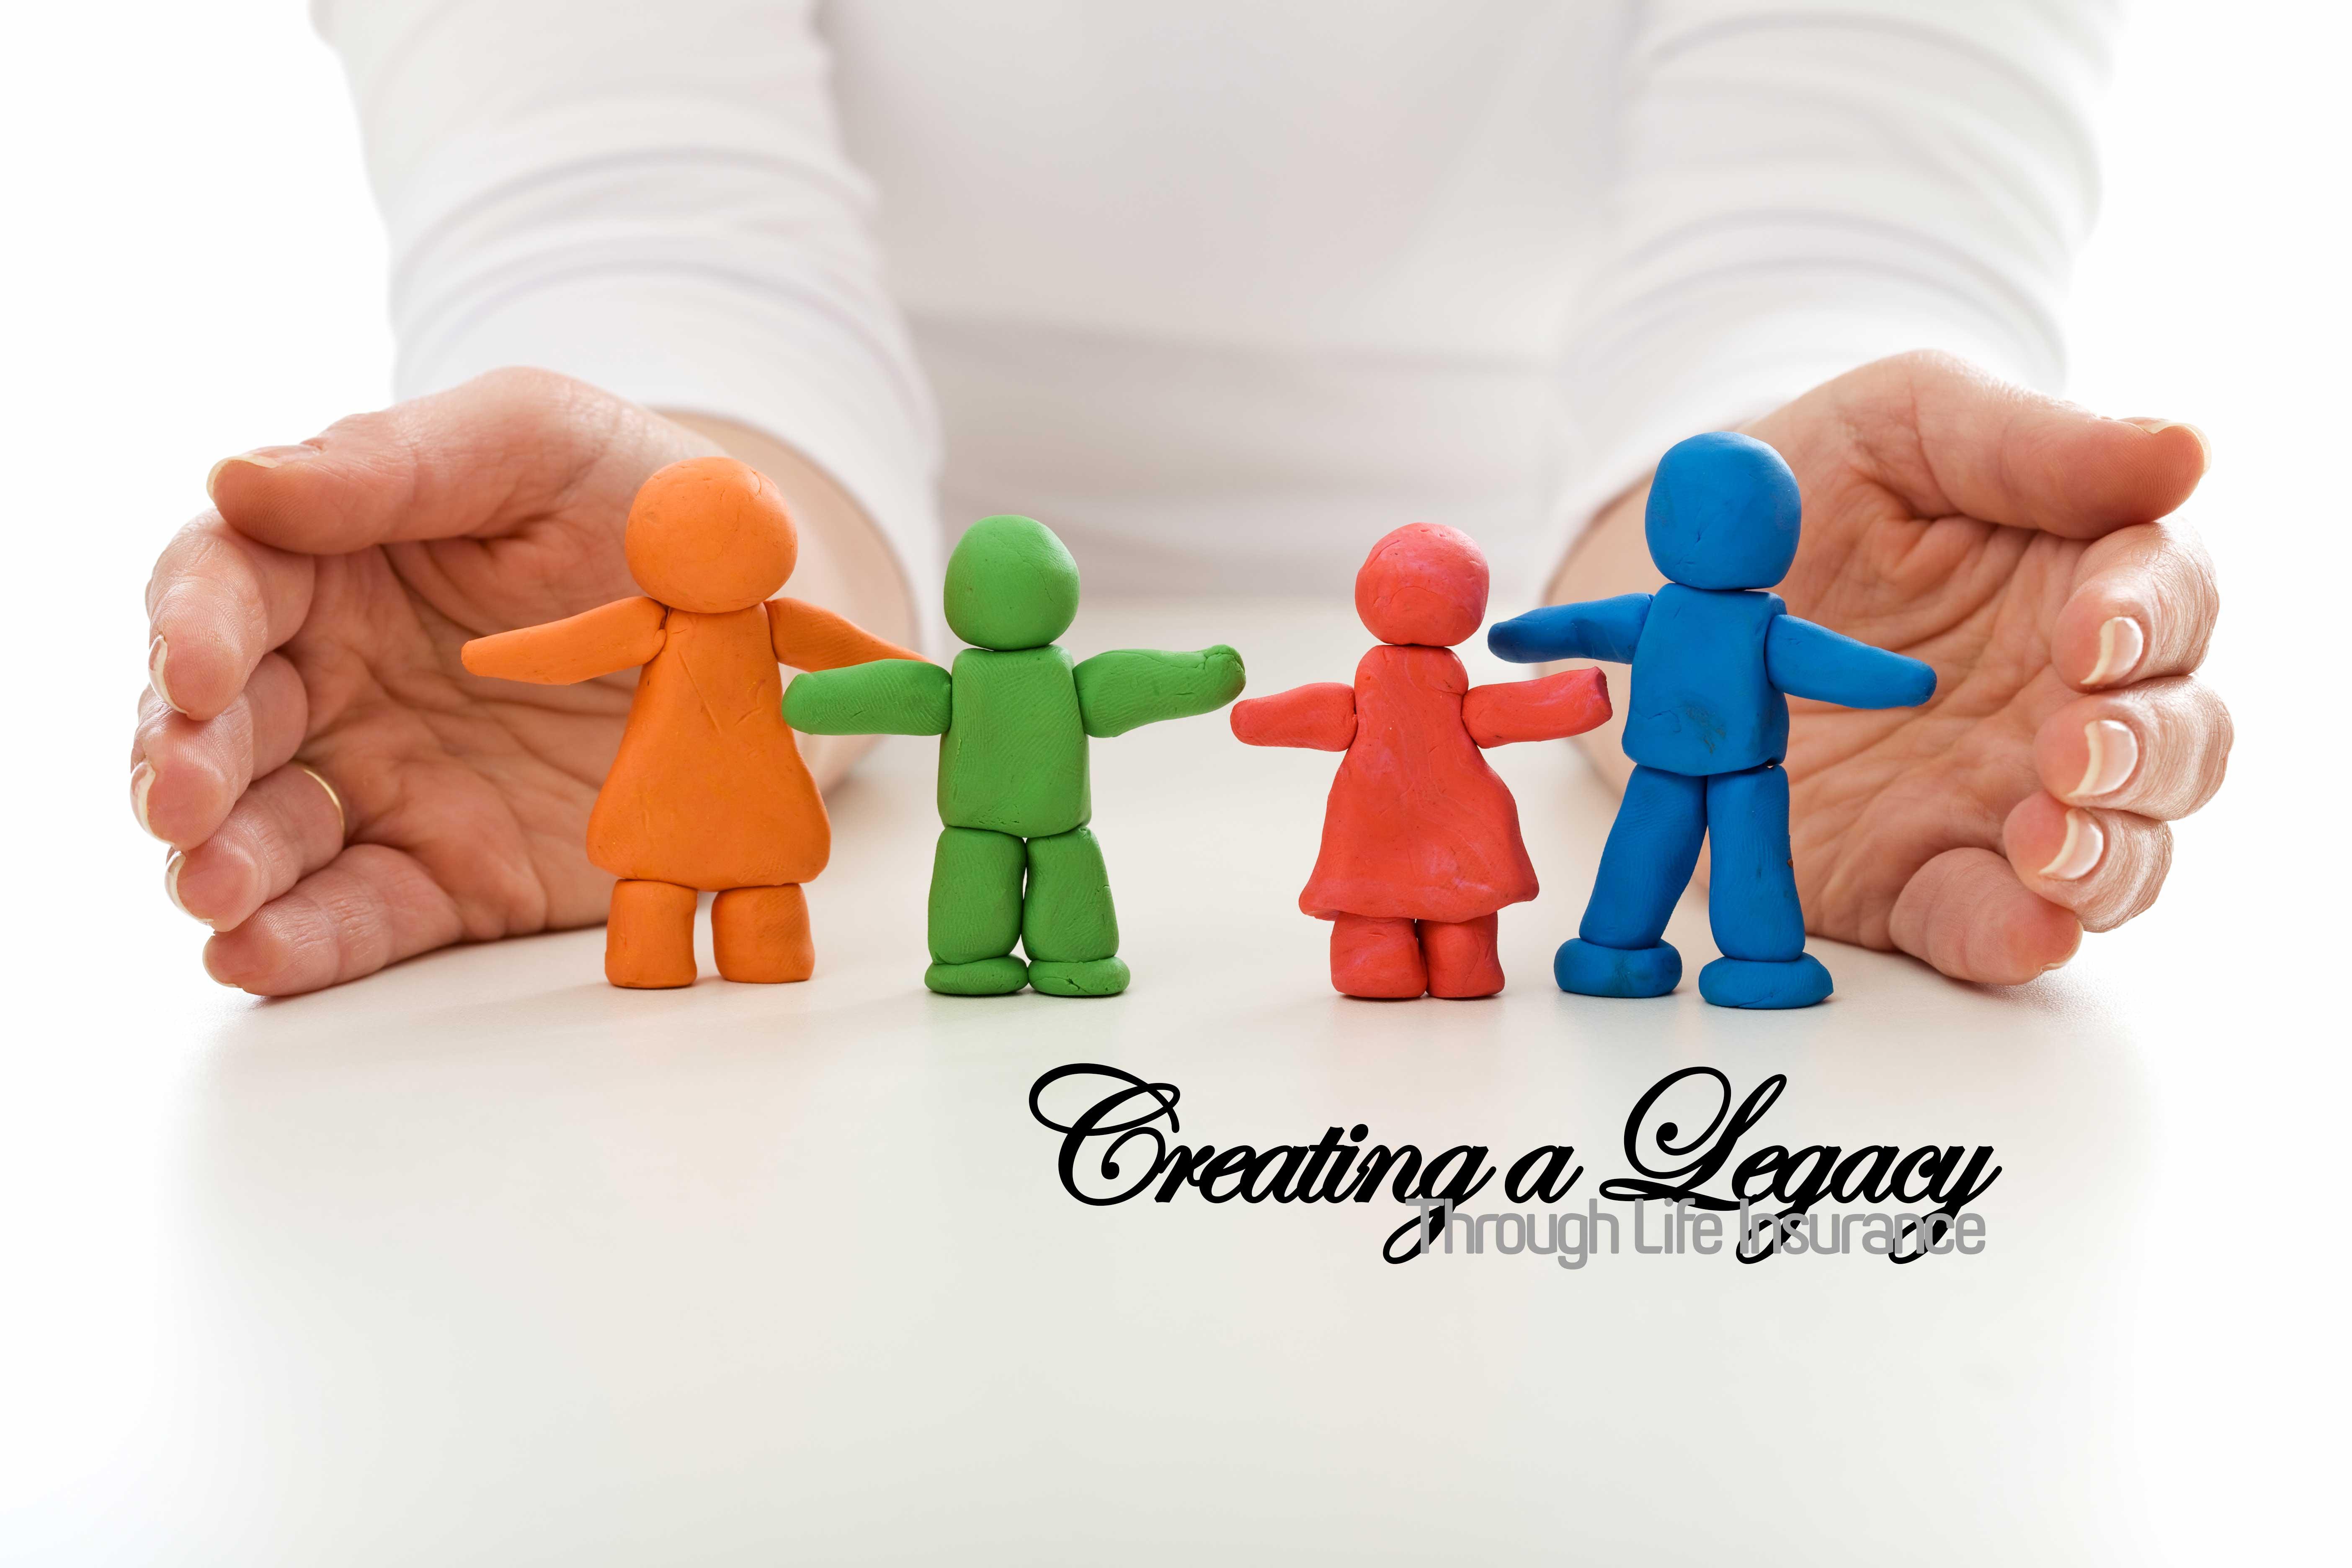 Creating a Legacy Through Life Insurance